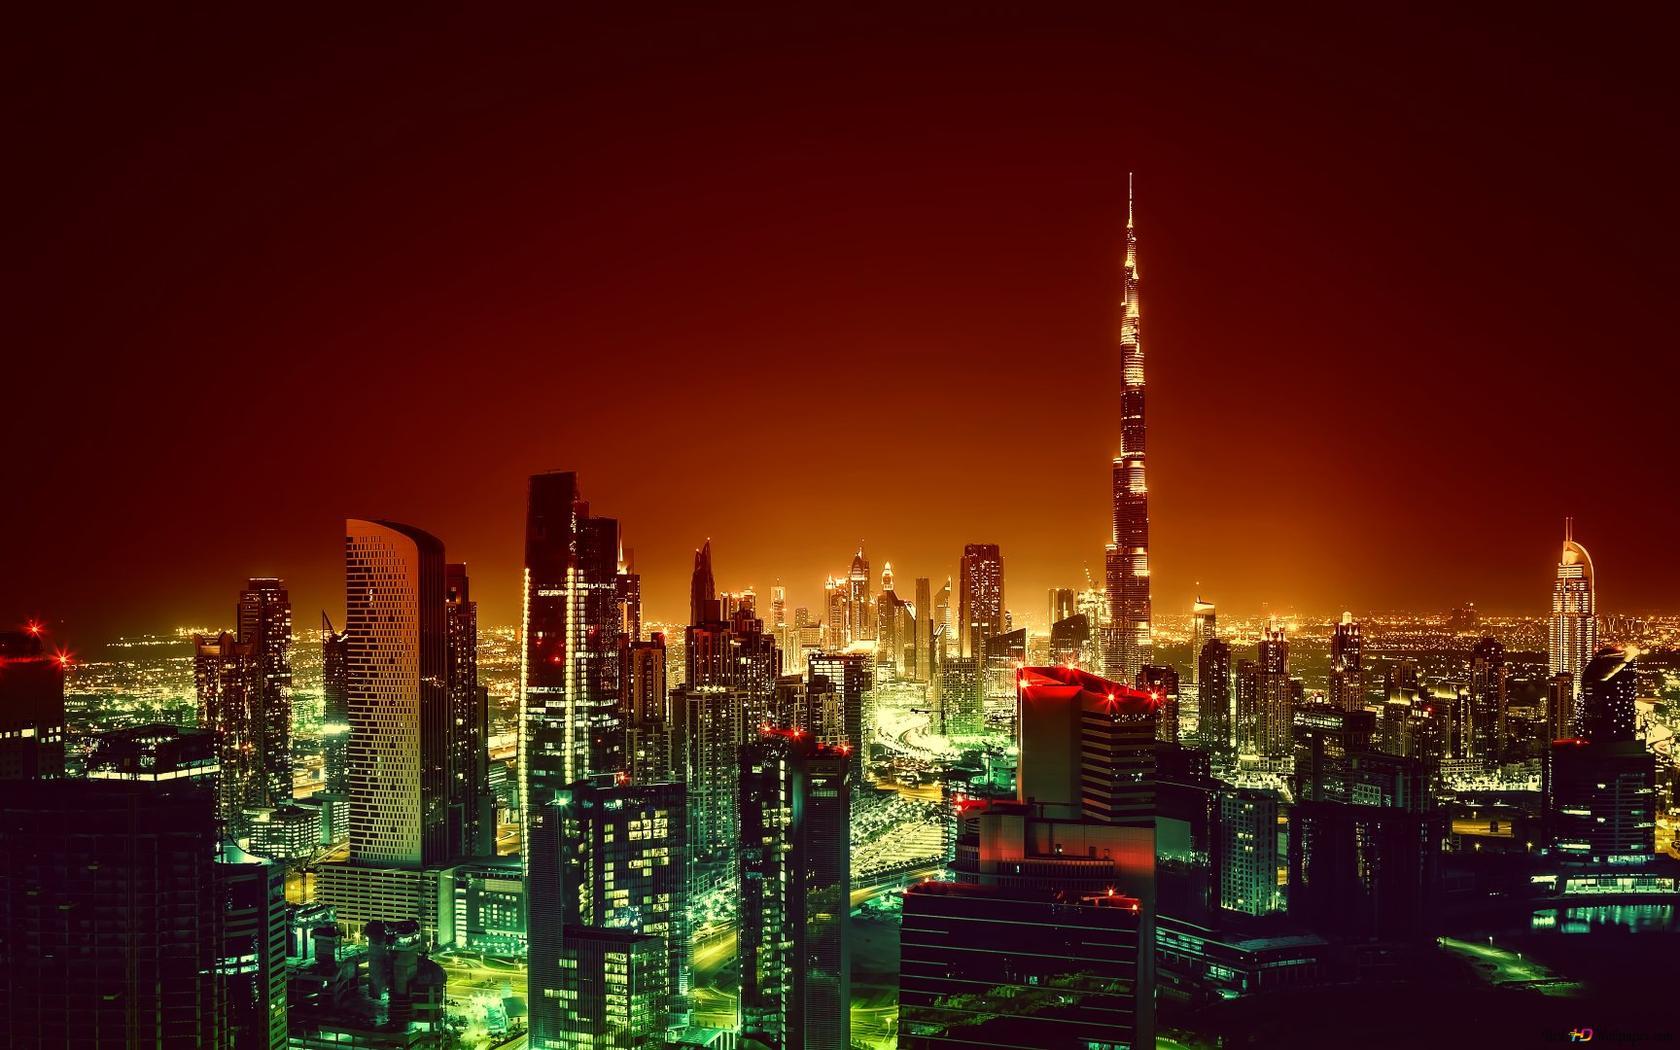 Descargar fondo de pantalla burj khalifa dubai hd - Dubai burj khalifa hd photos ...